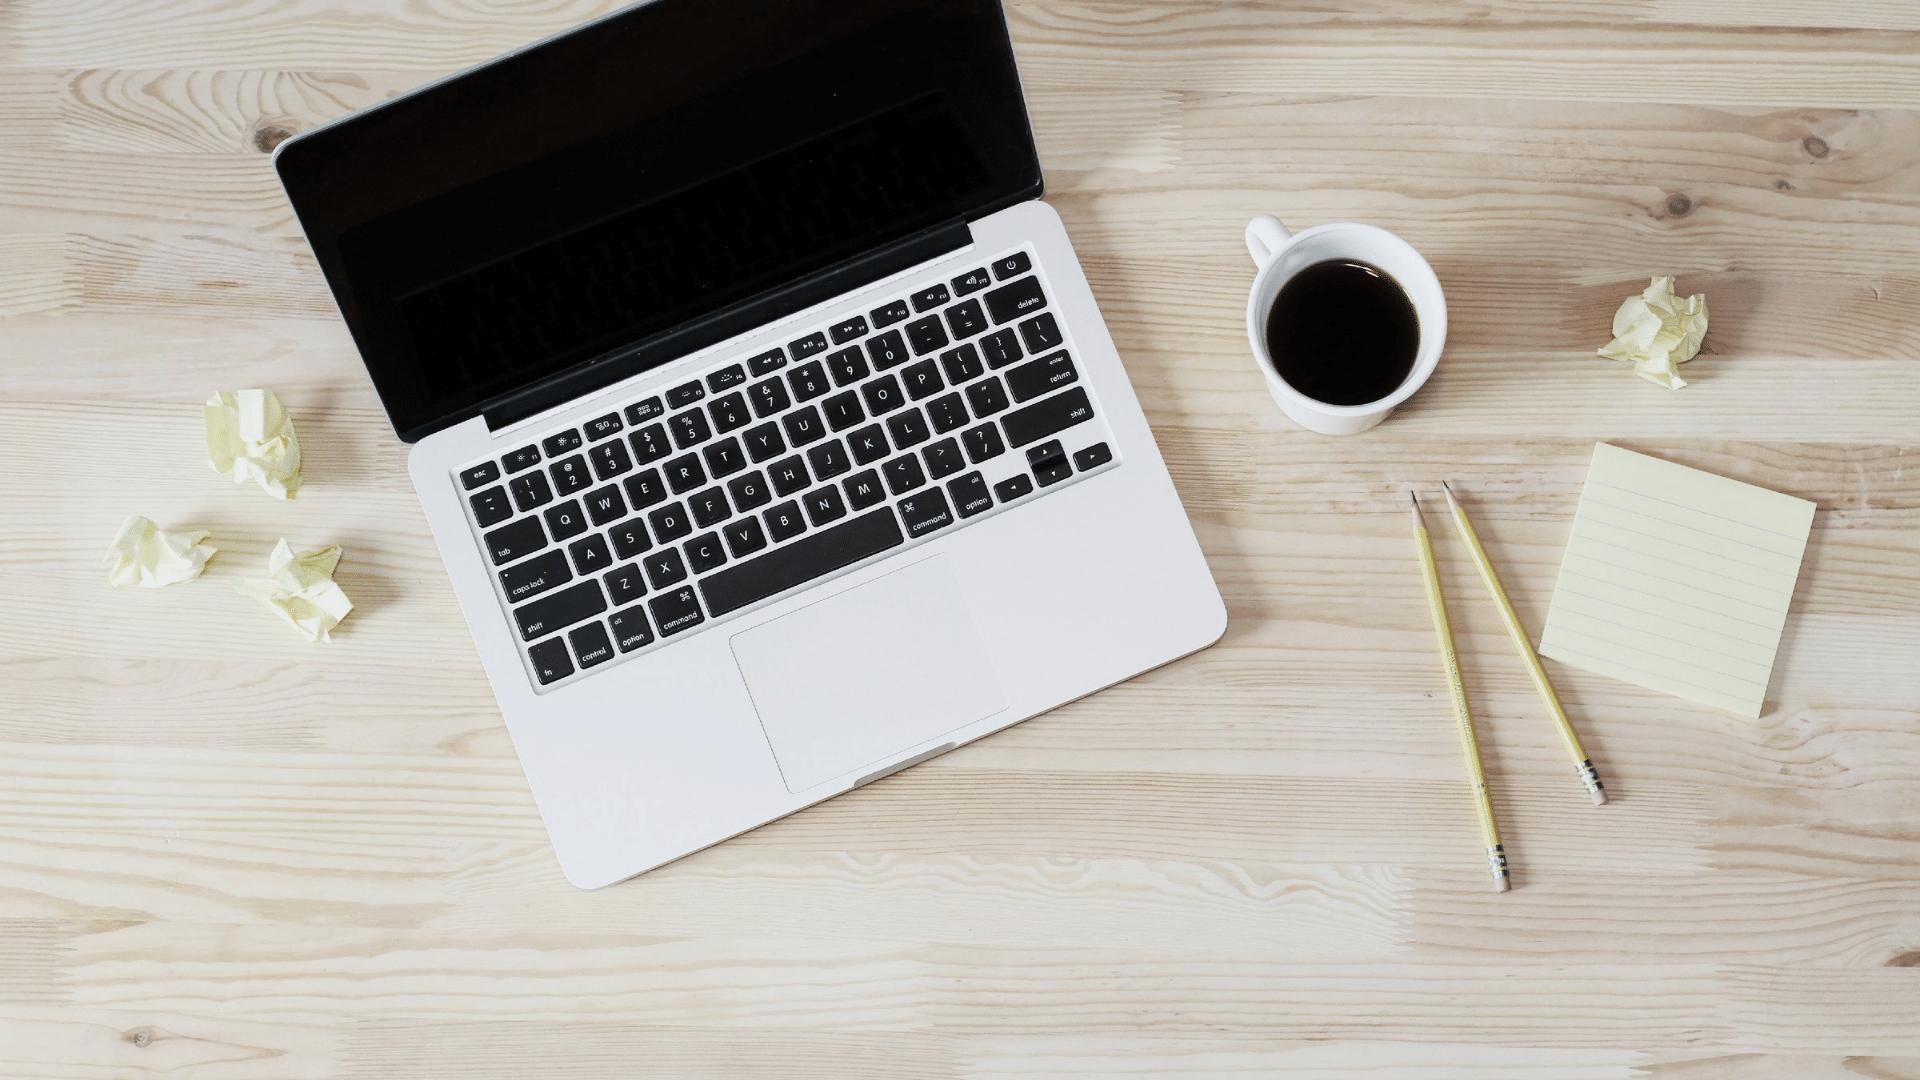 blogging for education lead generation